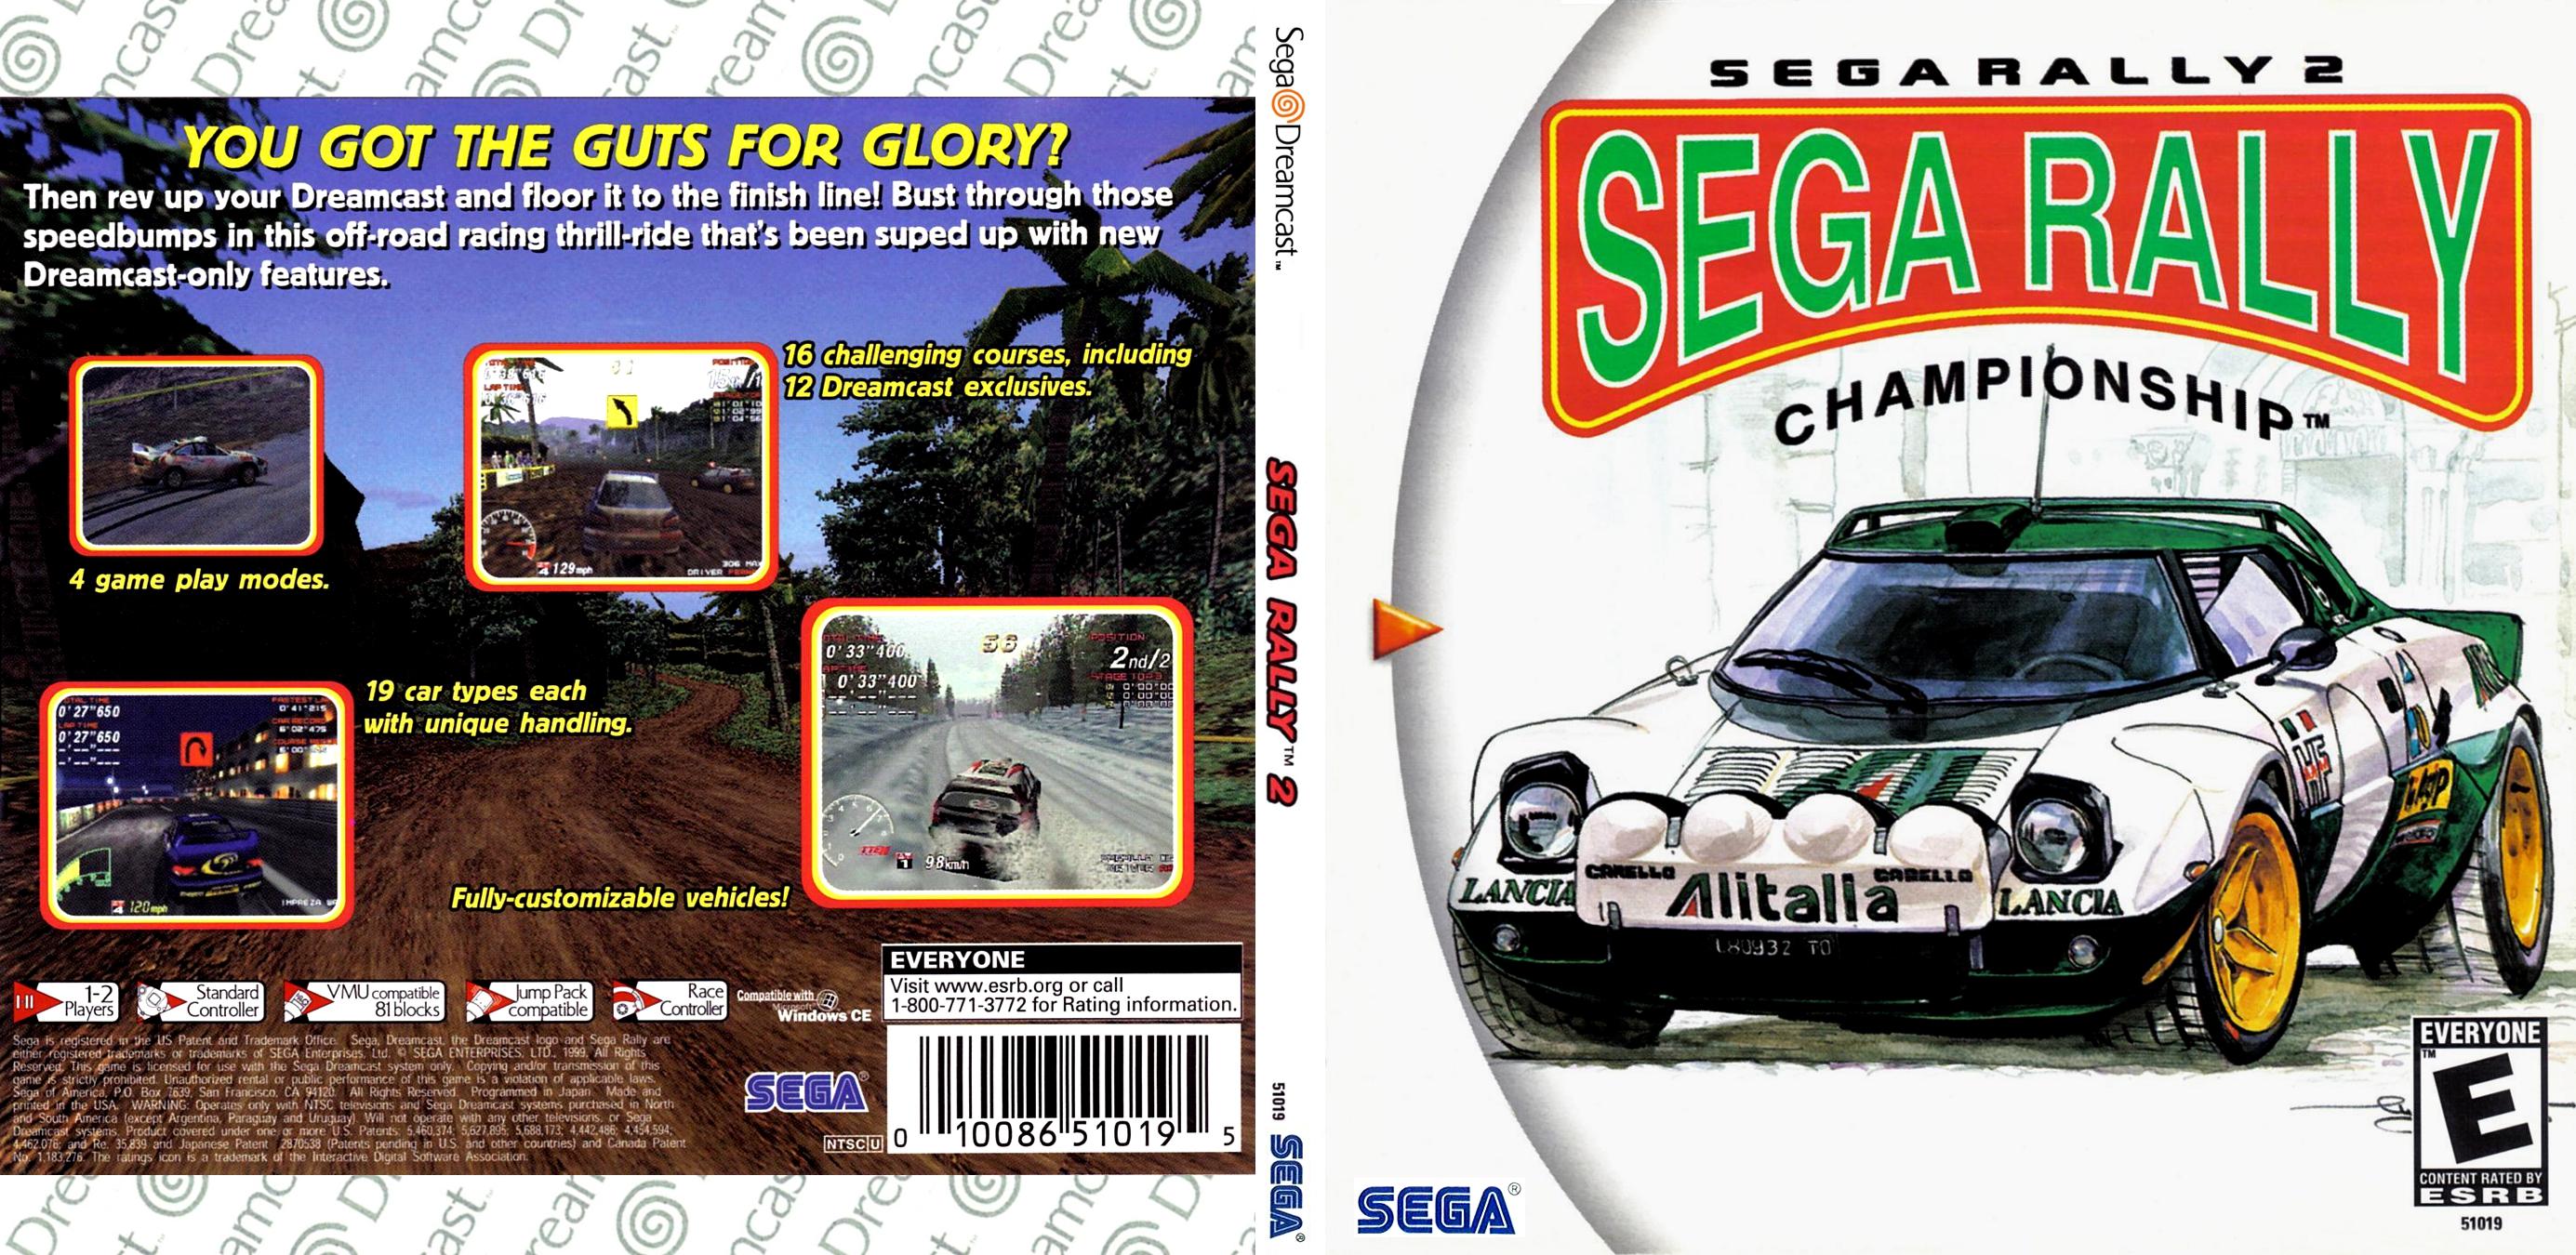 sega rally 2 arcade model 3 emulator